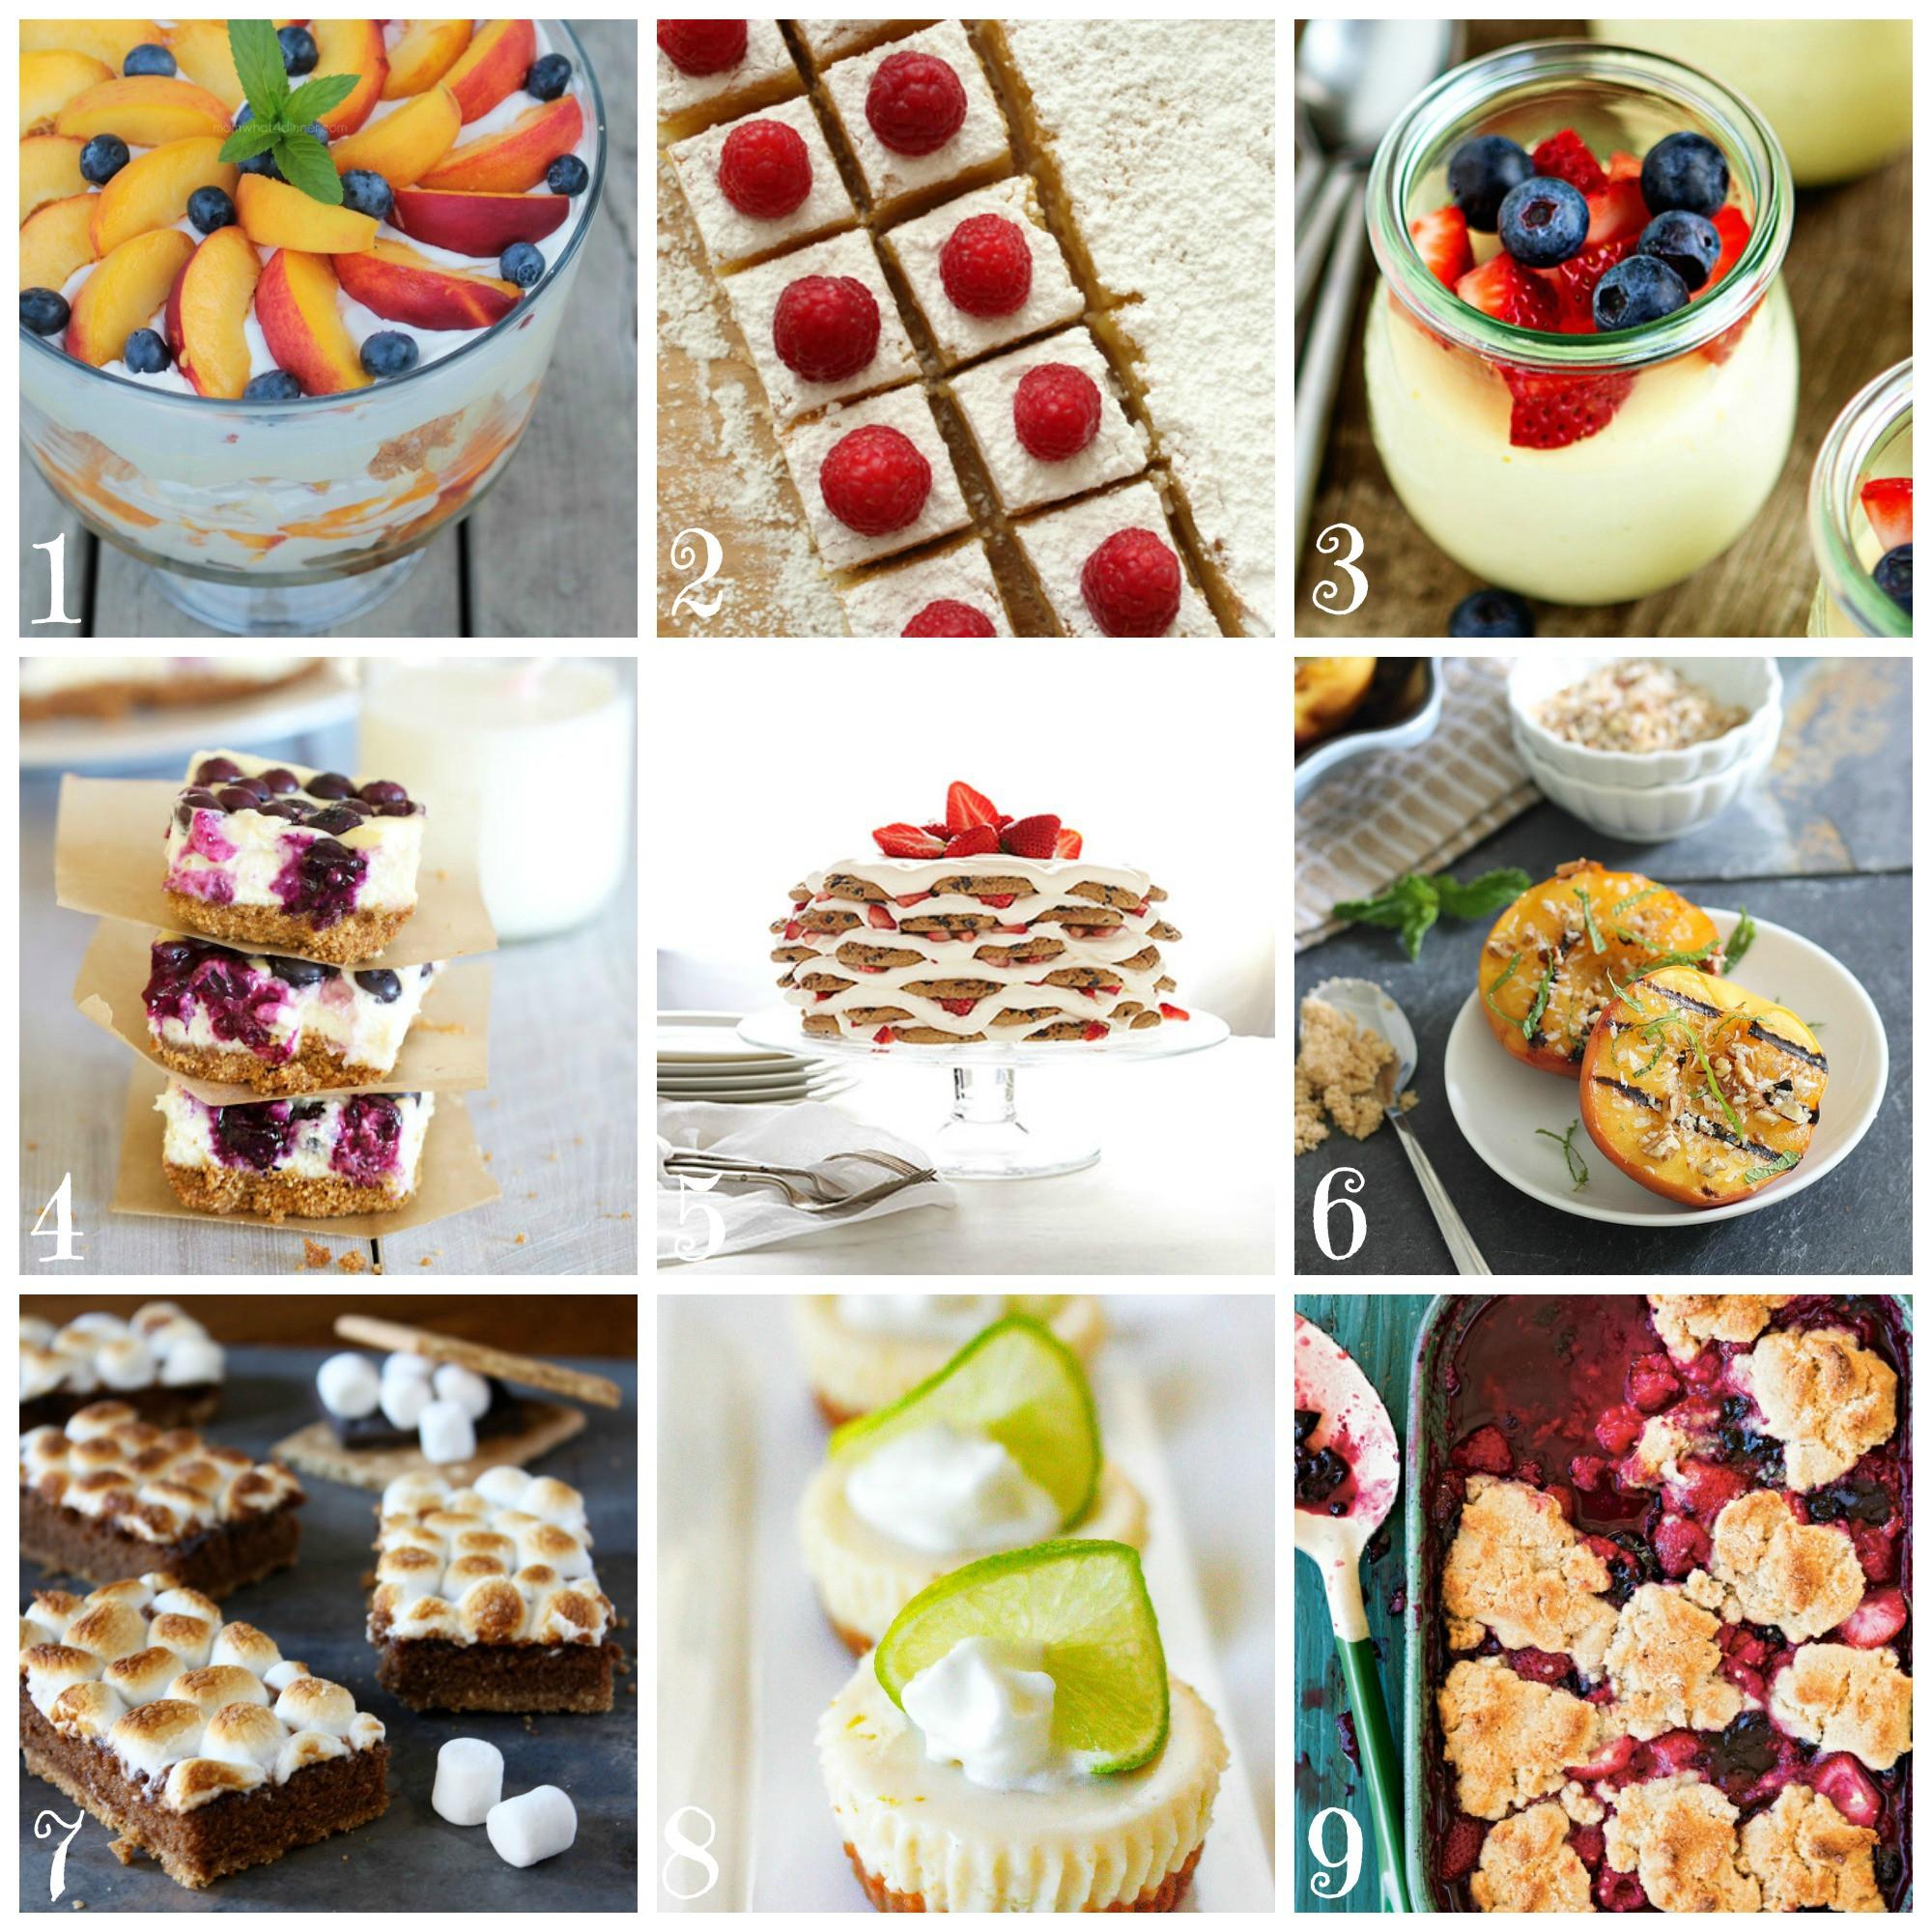 Great Summer Desserts  Best Summer Dessert Recipes • CakeJournal